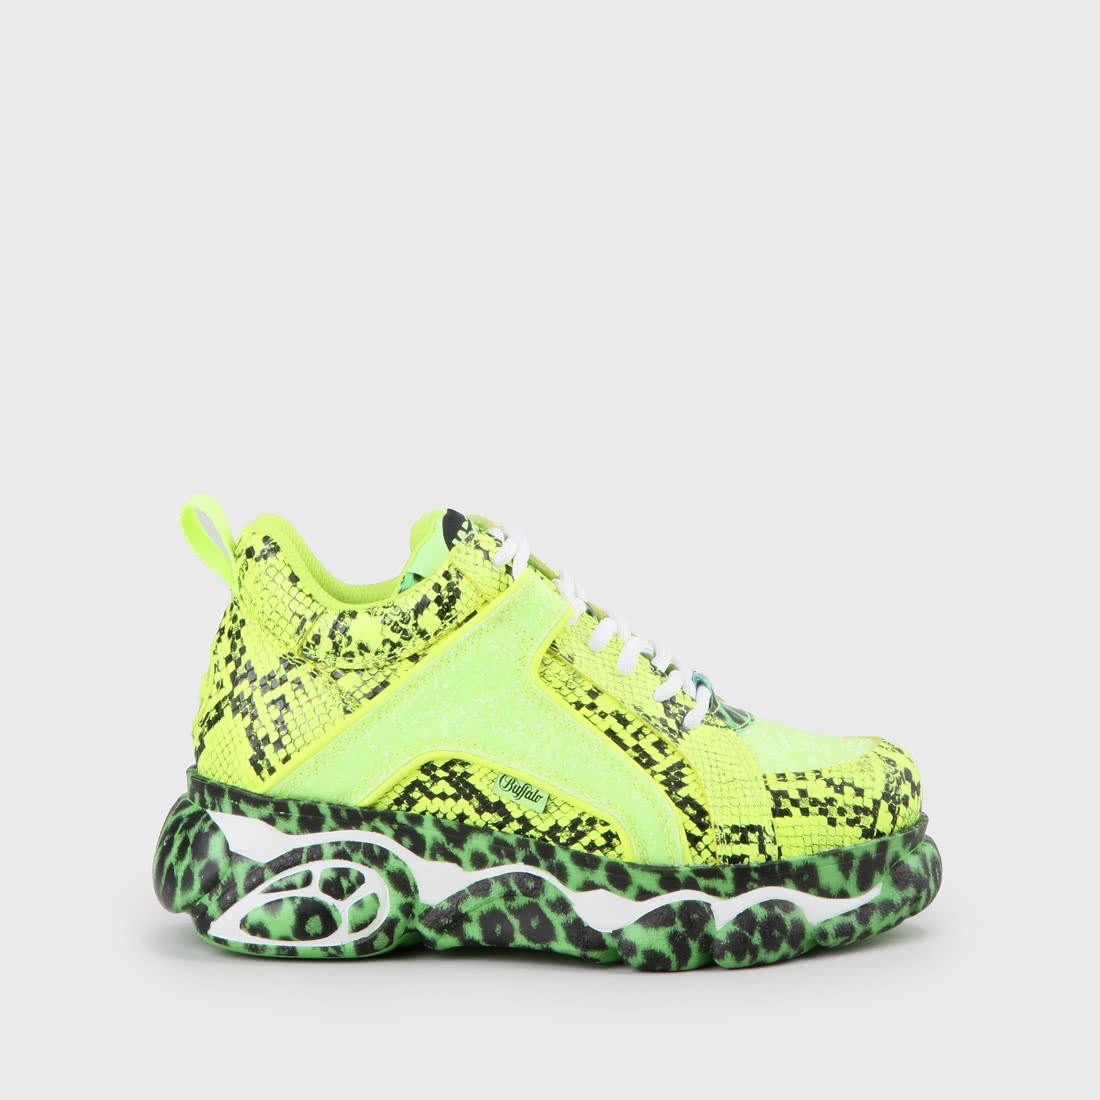 low priced 09b49 56981 Jaded x CLD Corin Sneaker snakeskin neon grün mit Glitzer ...